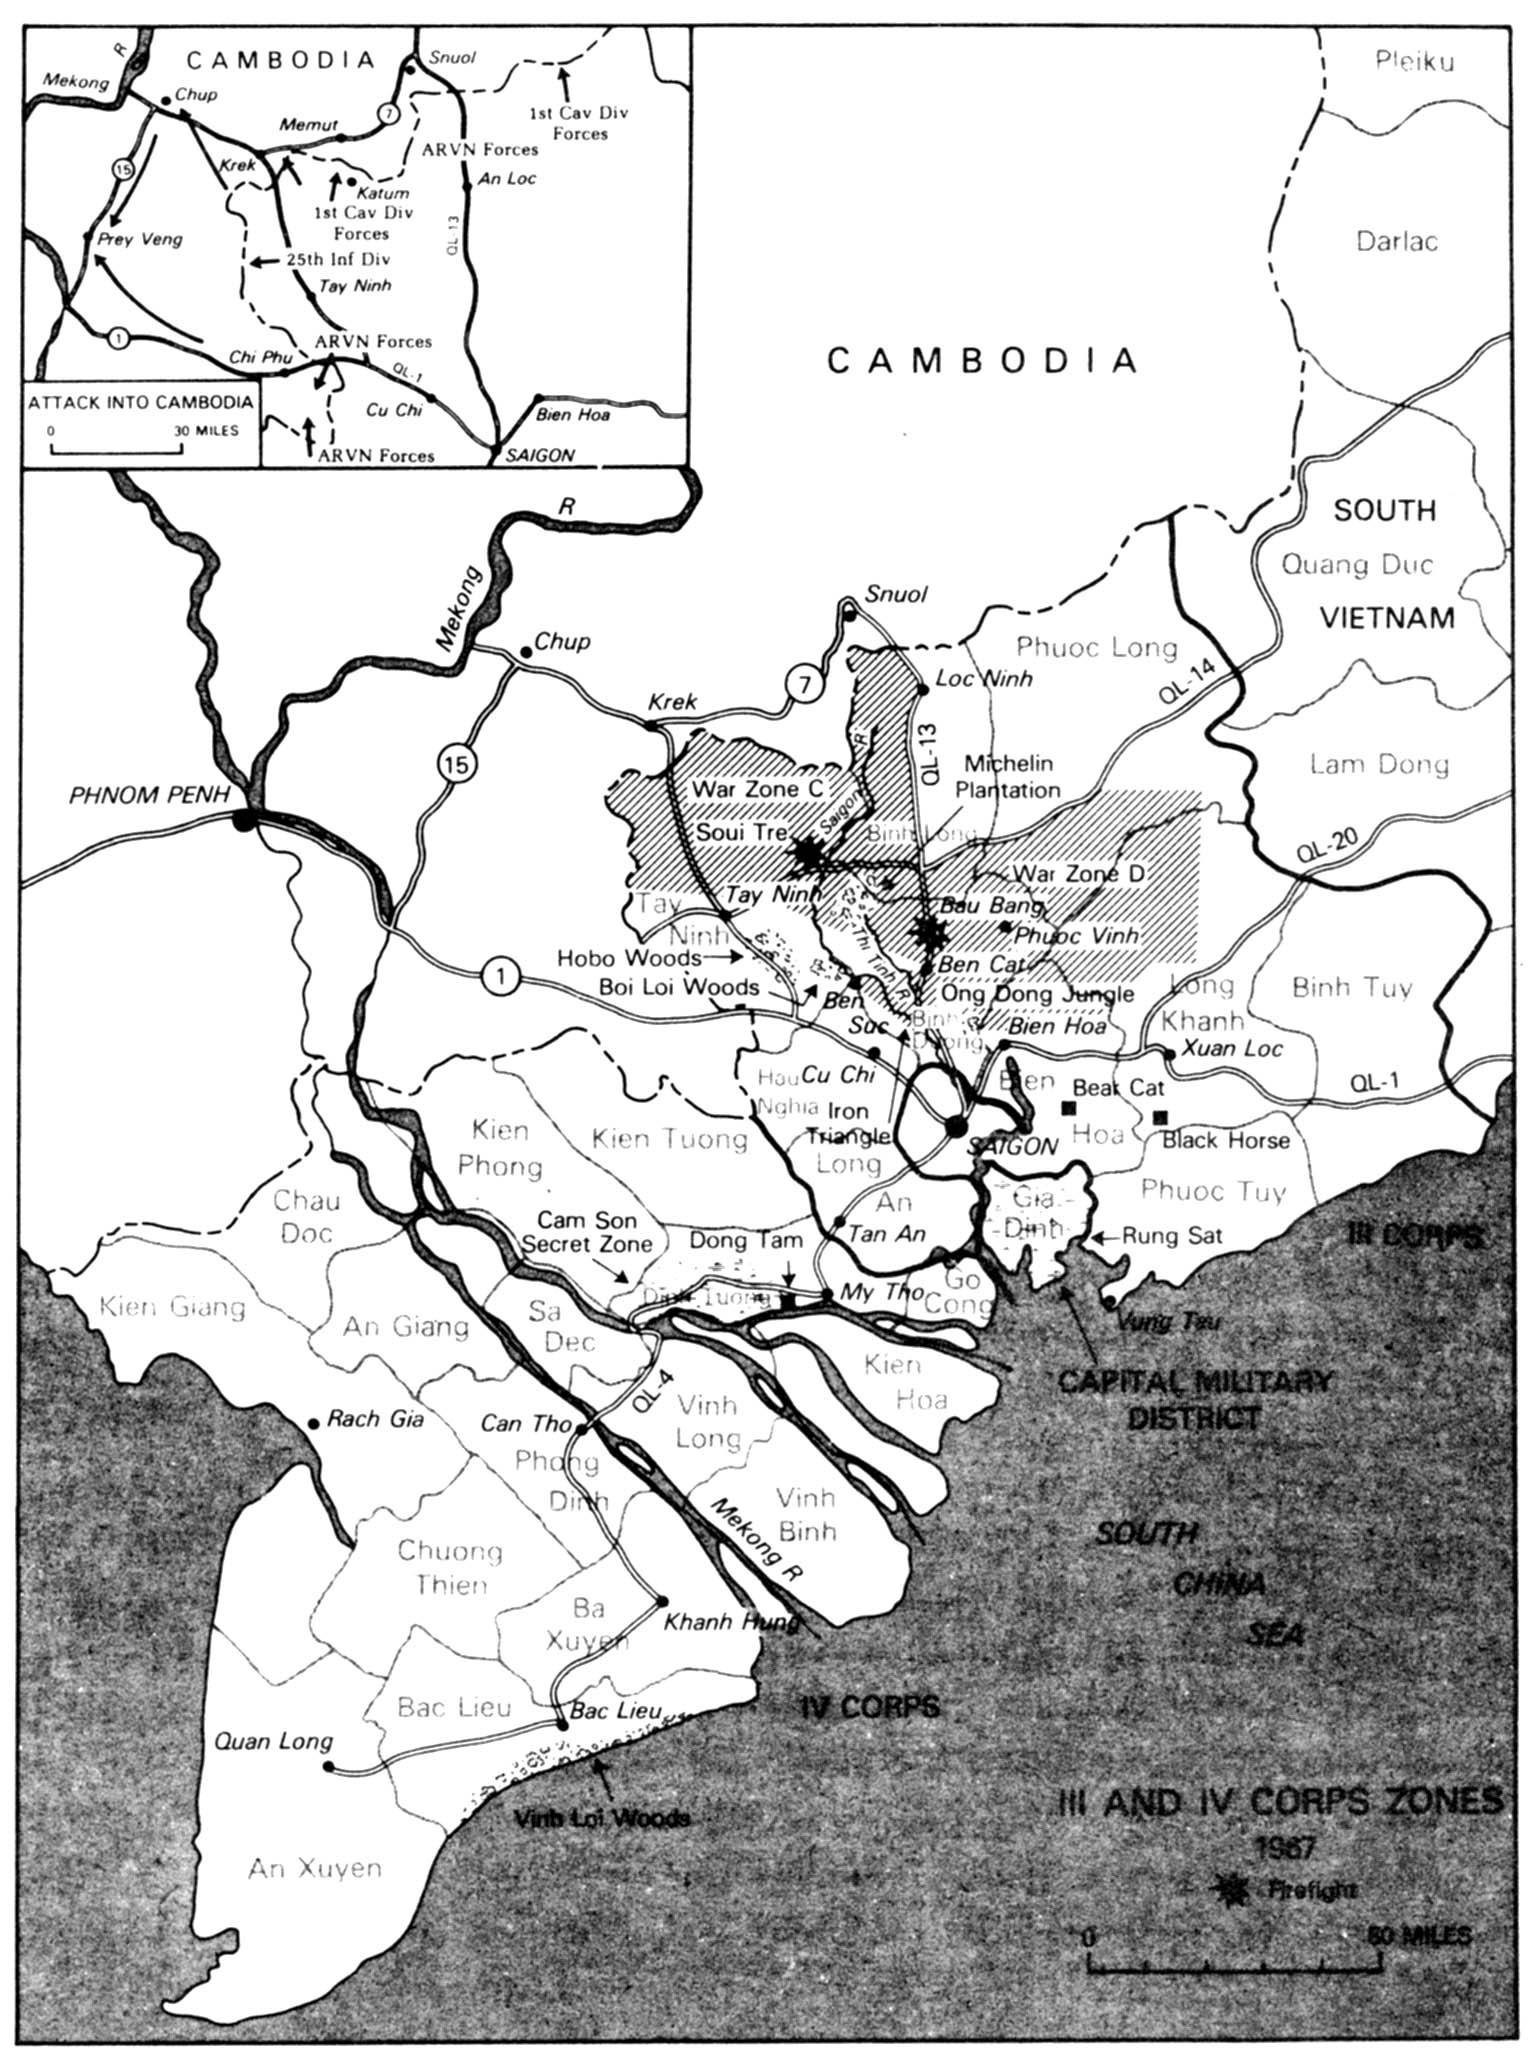 Iii An Iv Corps Zones